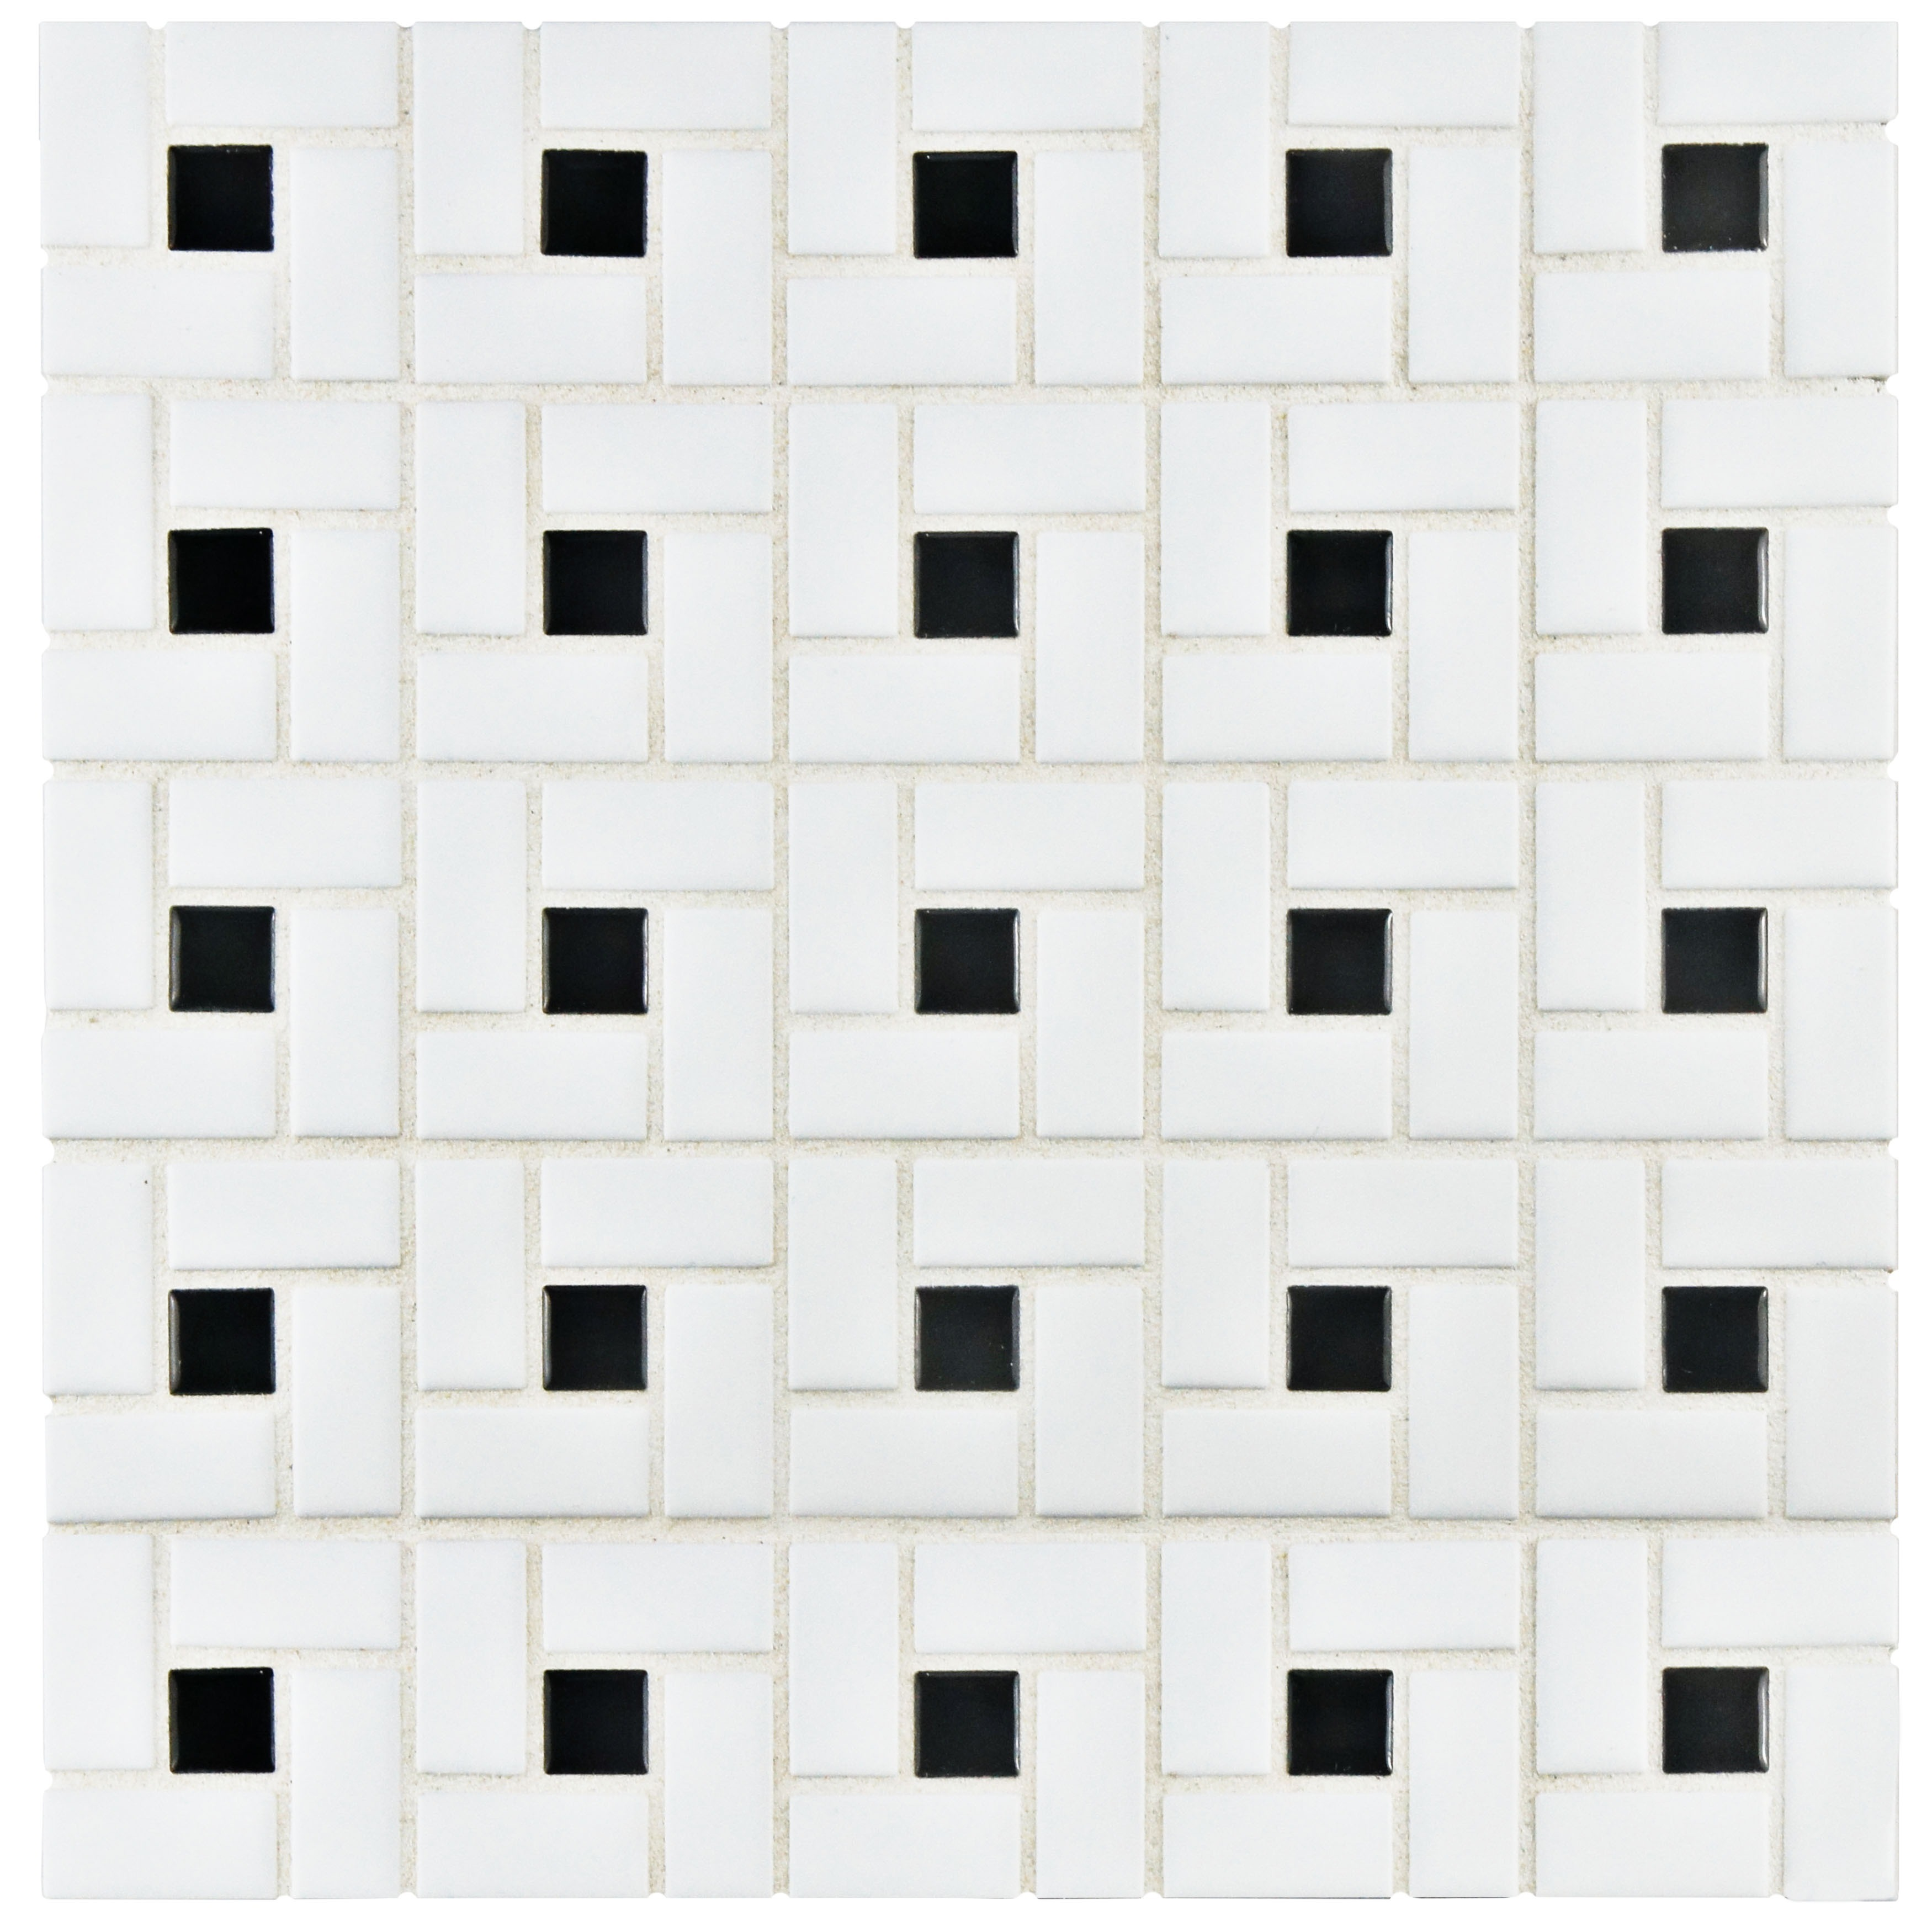 Somertile White Black Porcelain 12 5 Inch X Spiral Mosaic Tile Set Of 10 Free Shipping Today 4509756